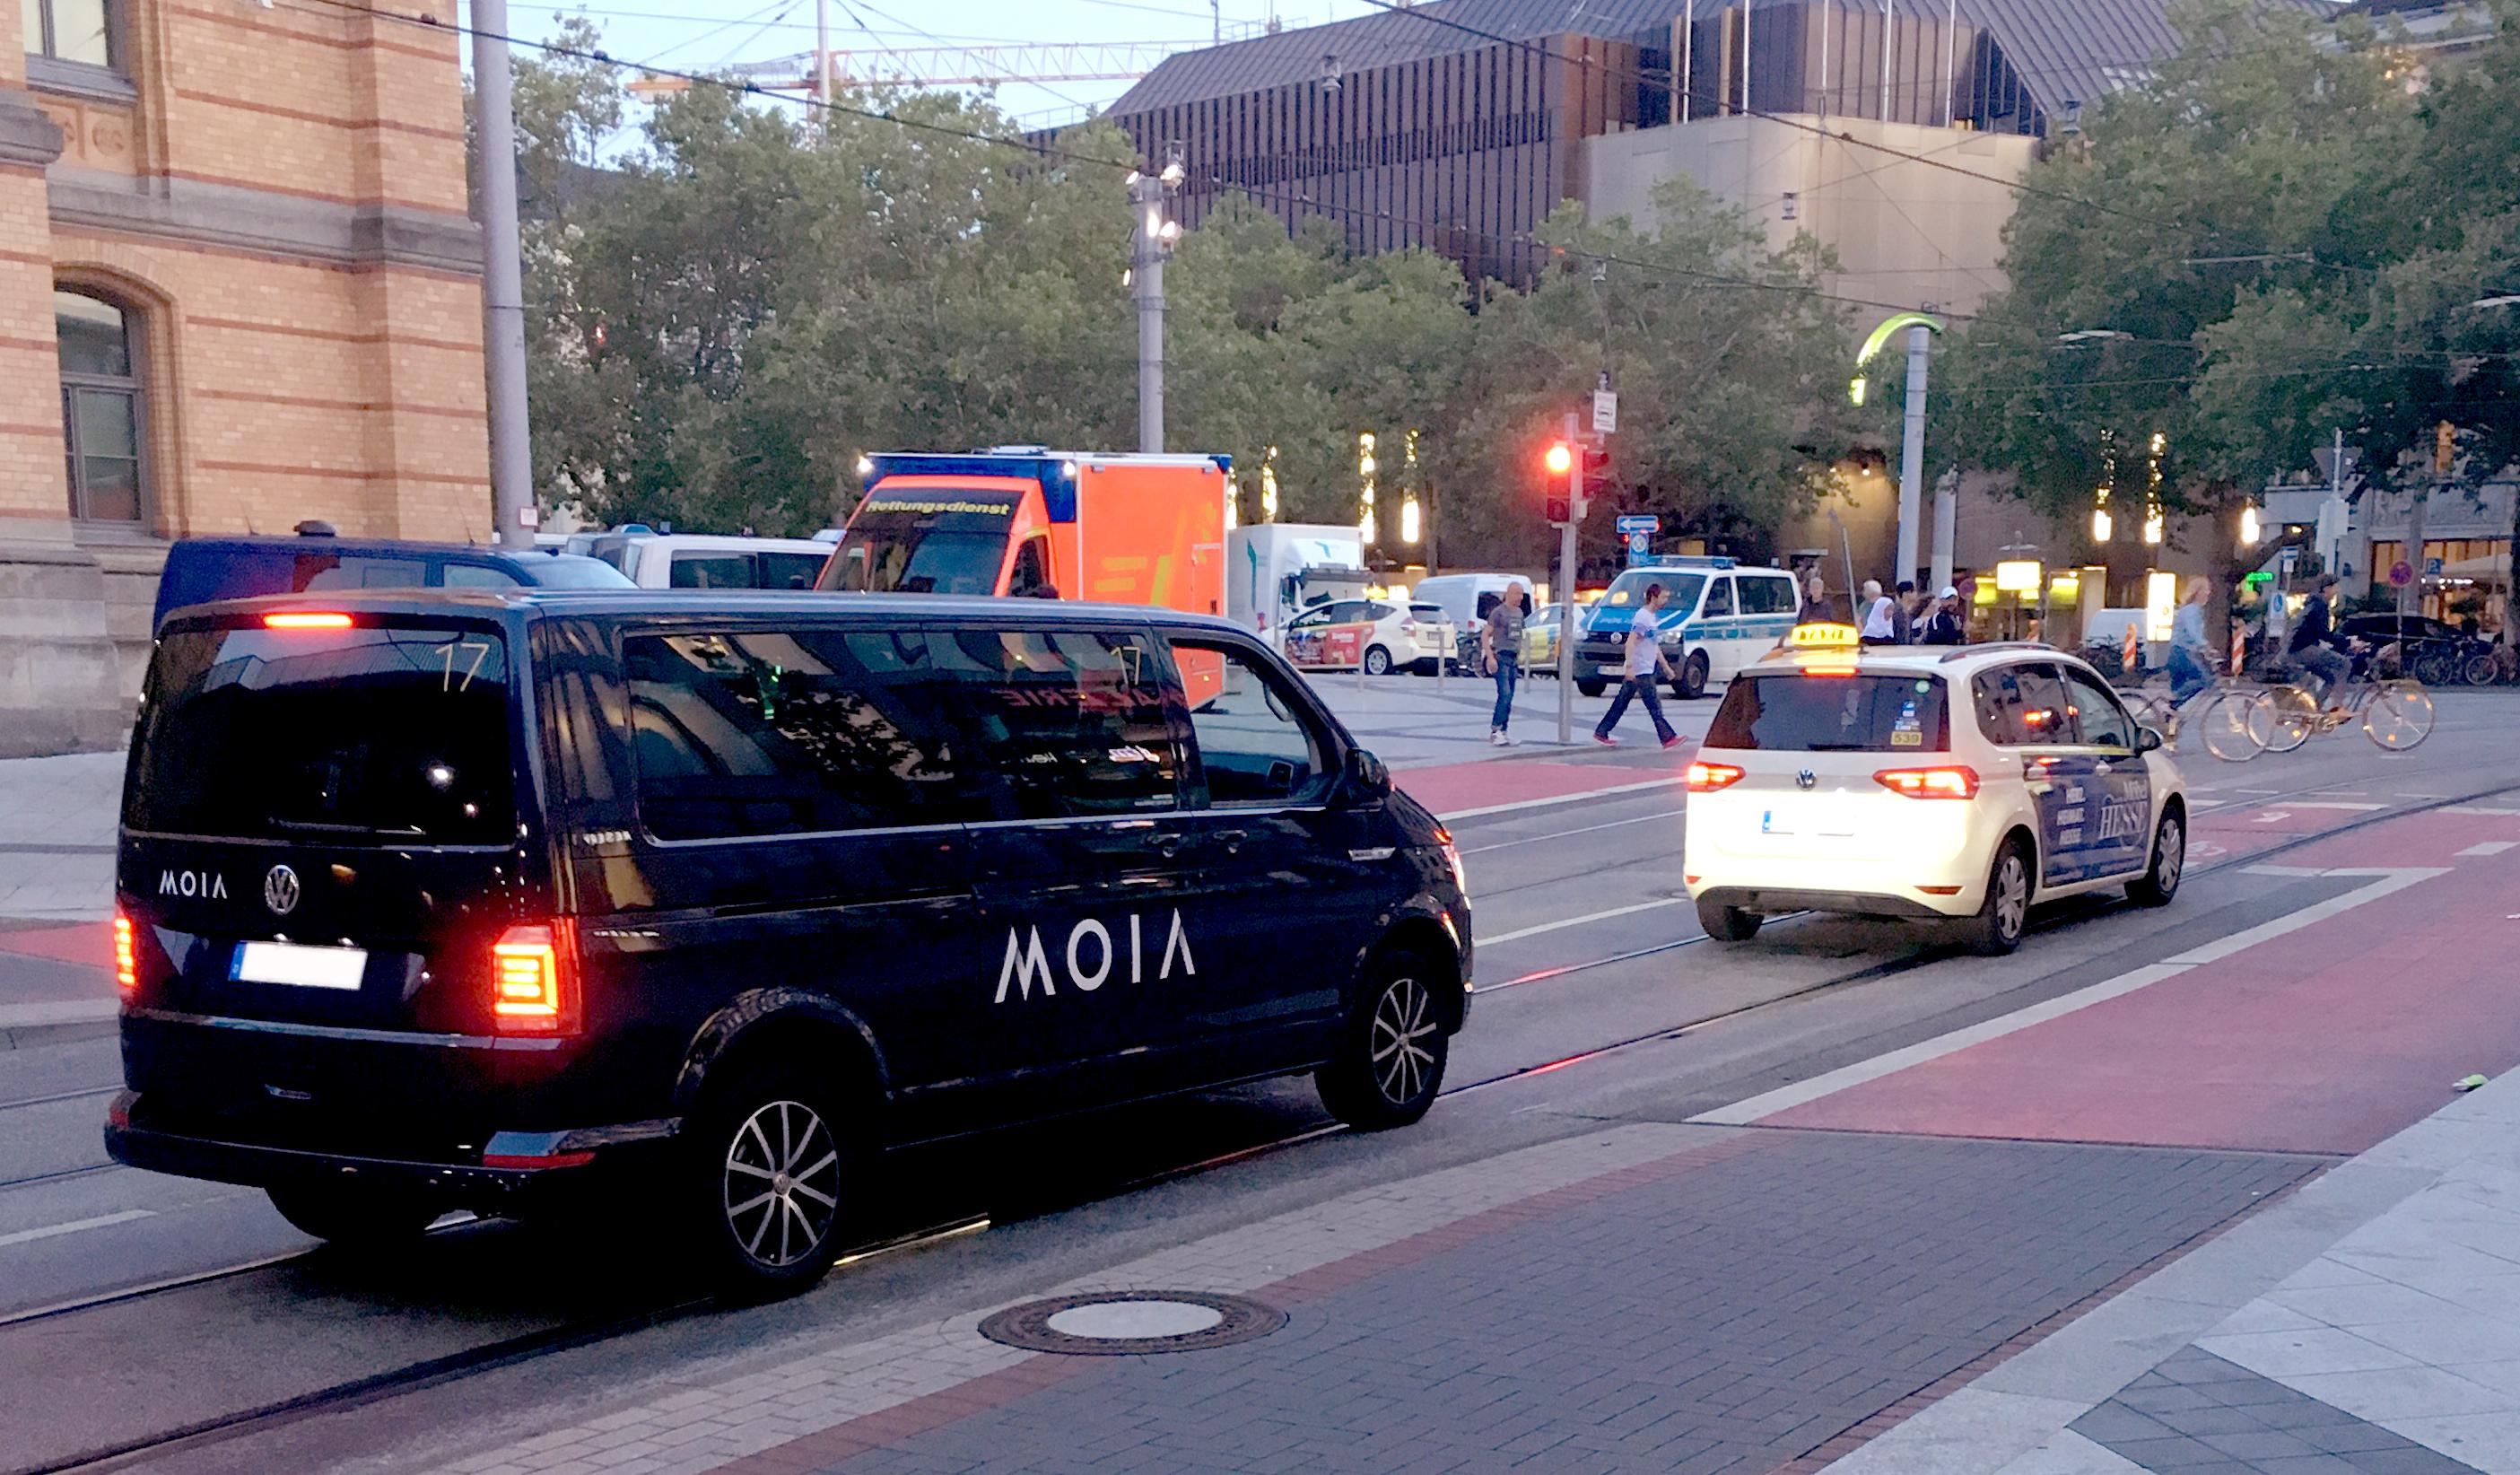 MOIA Fahrzeug